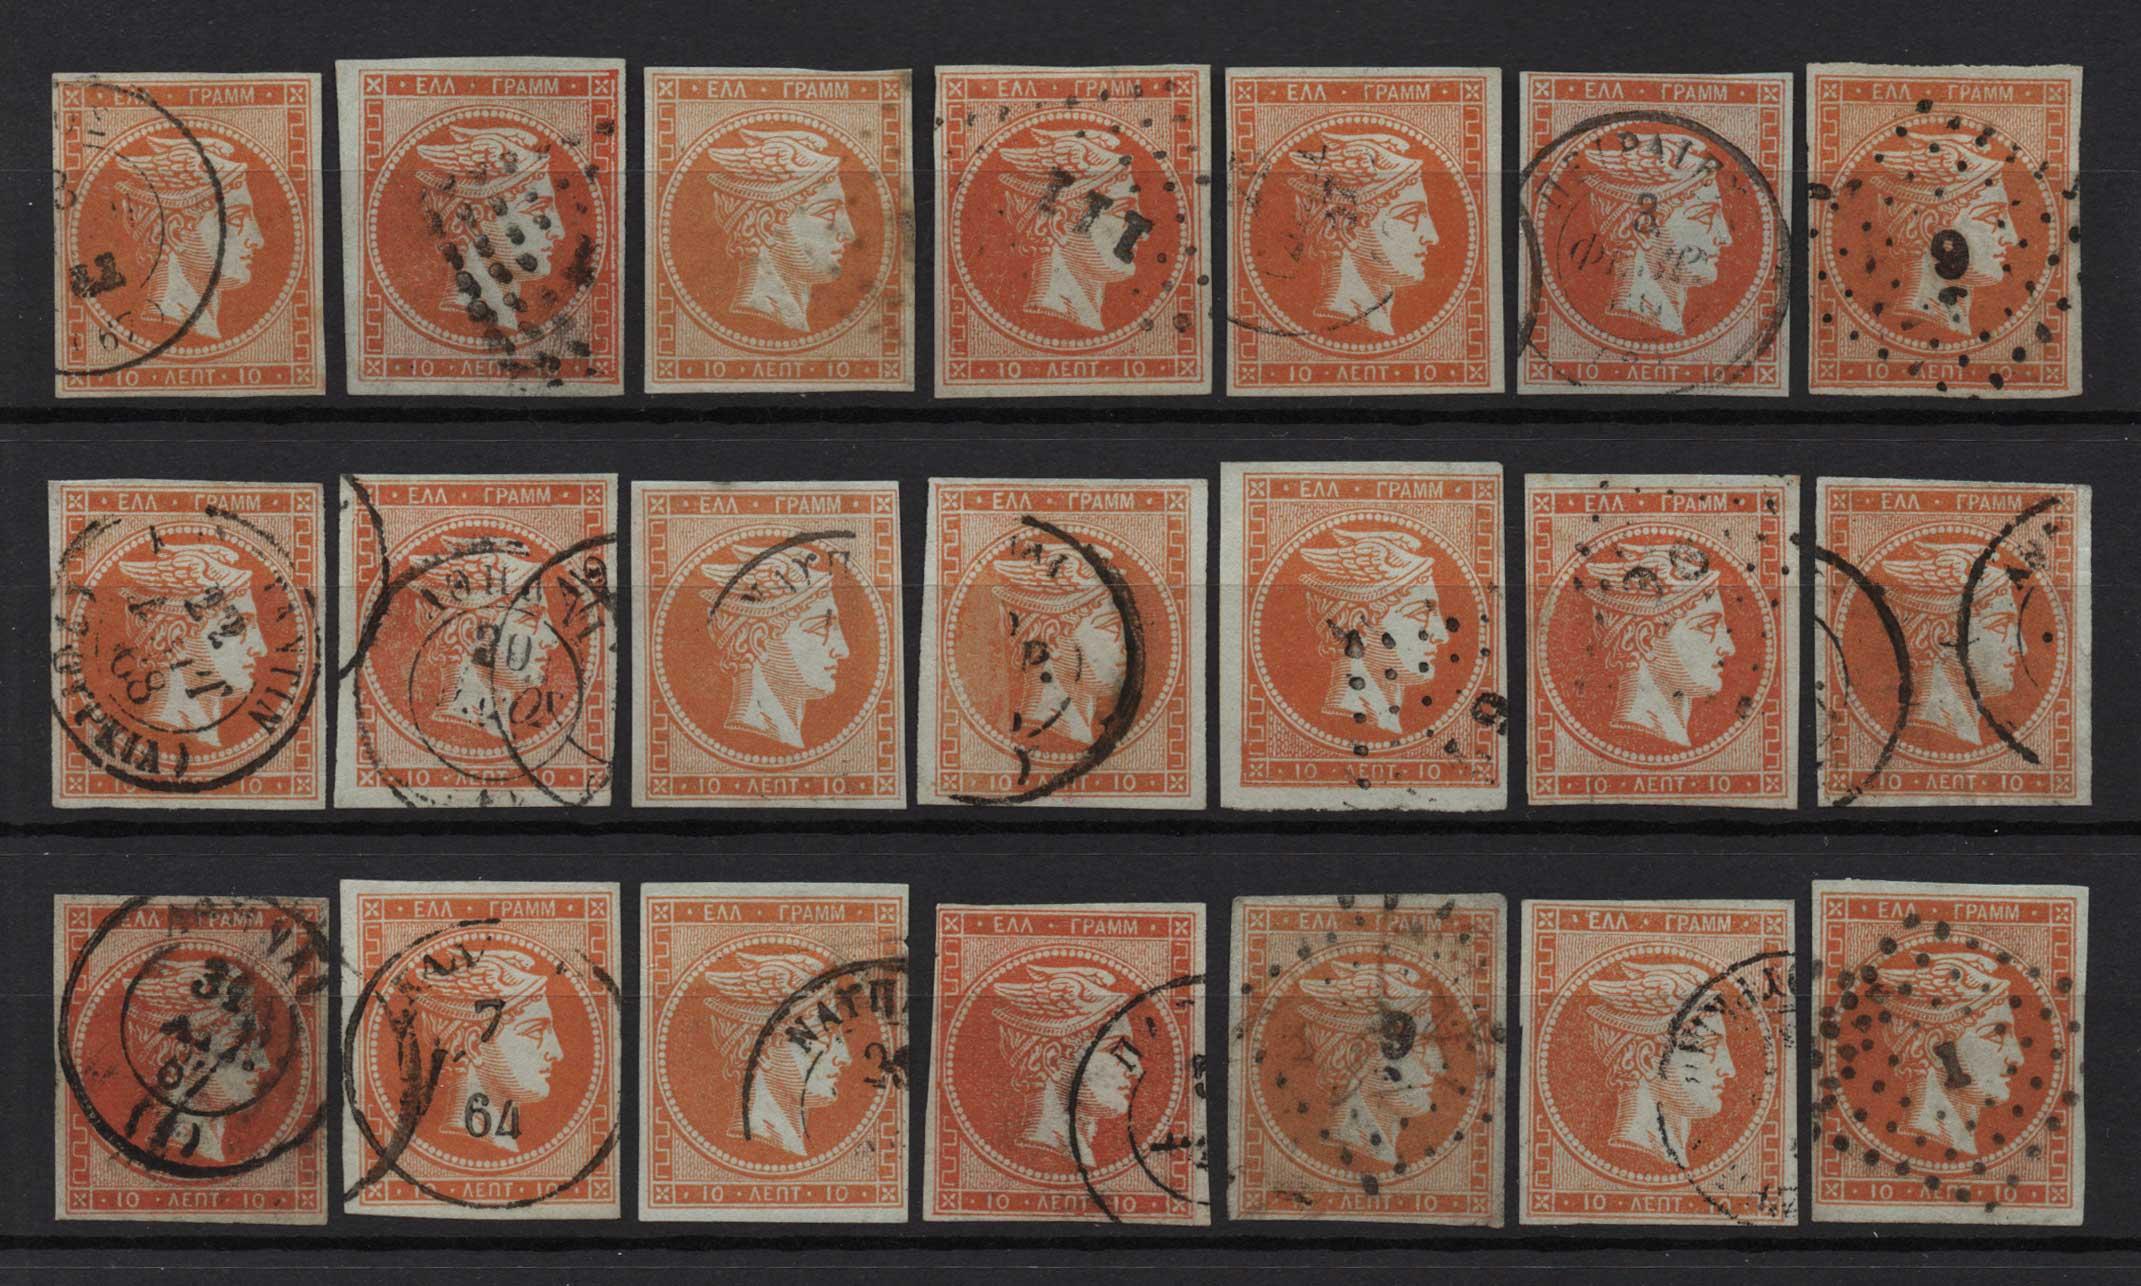 Lot 10 - -  LARGE HERMES HEAD large hermes head -  Athens Auctions Public Auction 72 General Stamp Sale